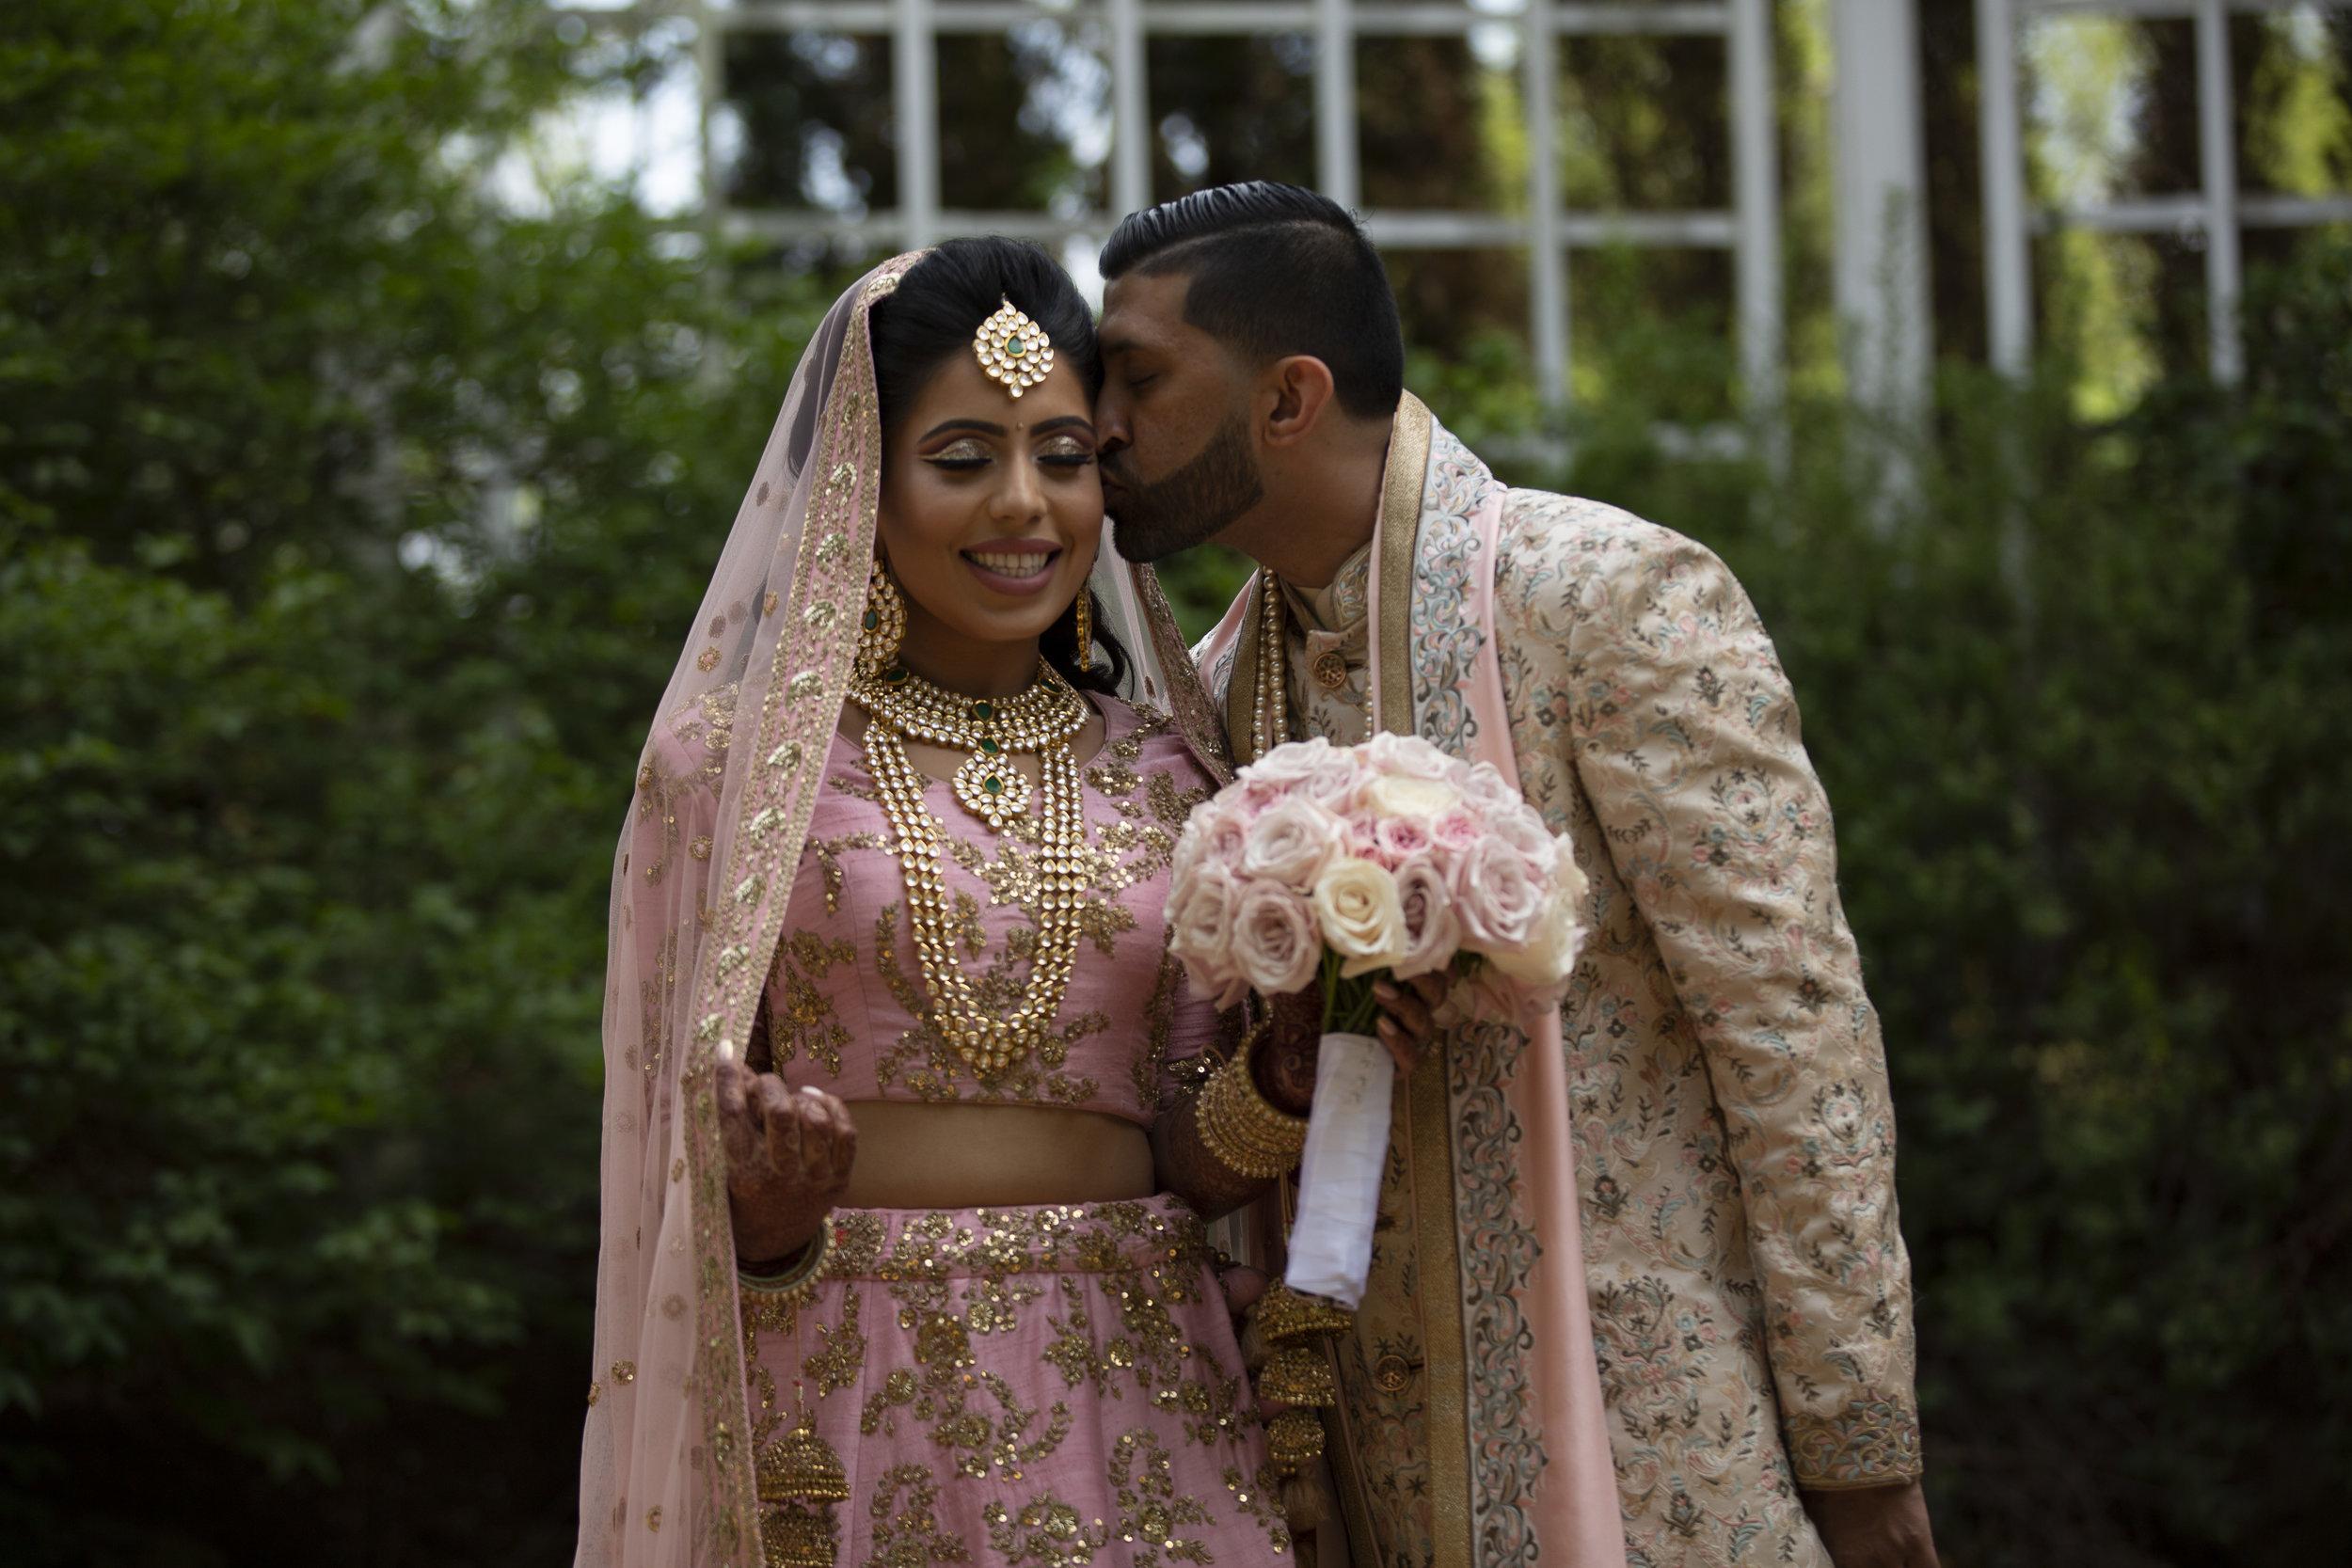 INDIAN WEDDING CEREMONY BRIDE AND GROOM.JPG